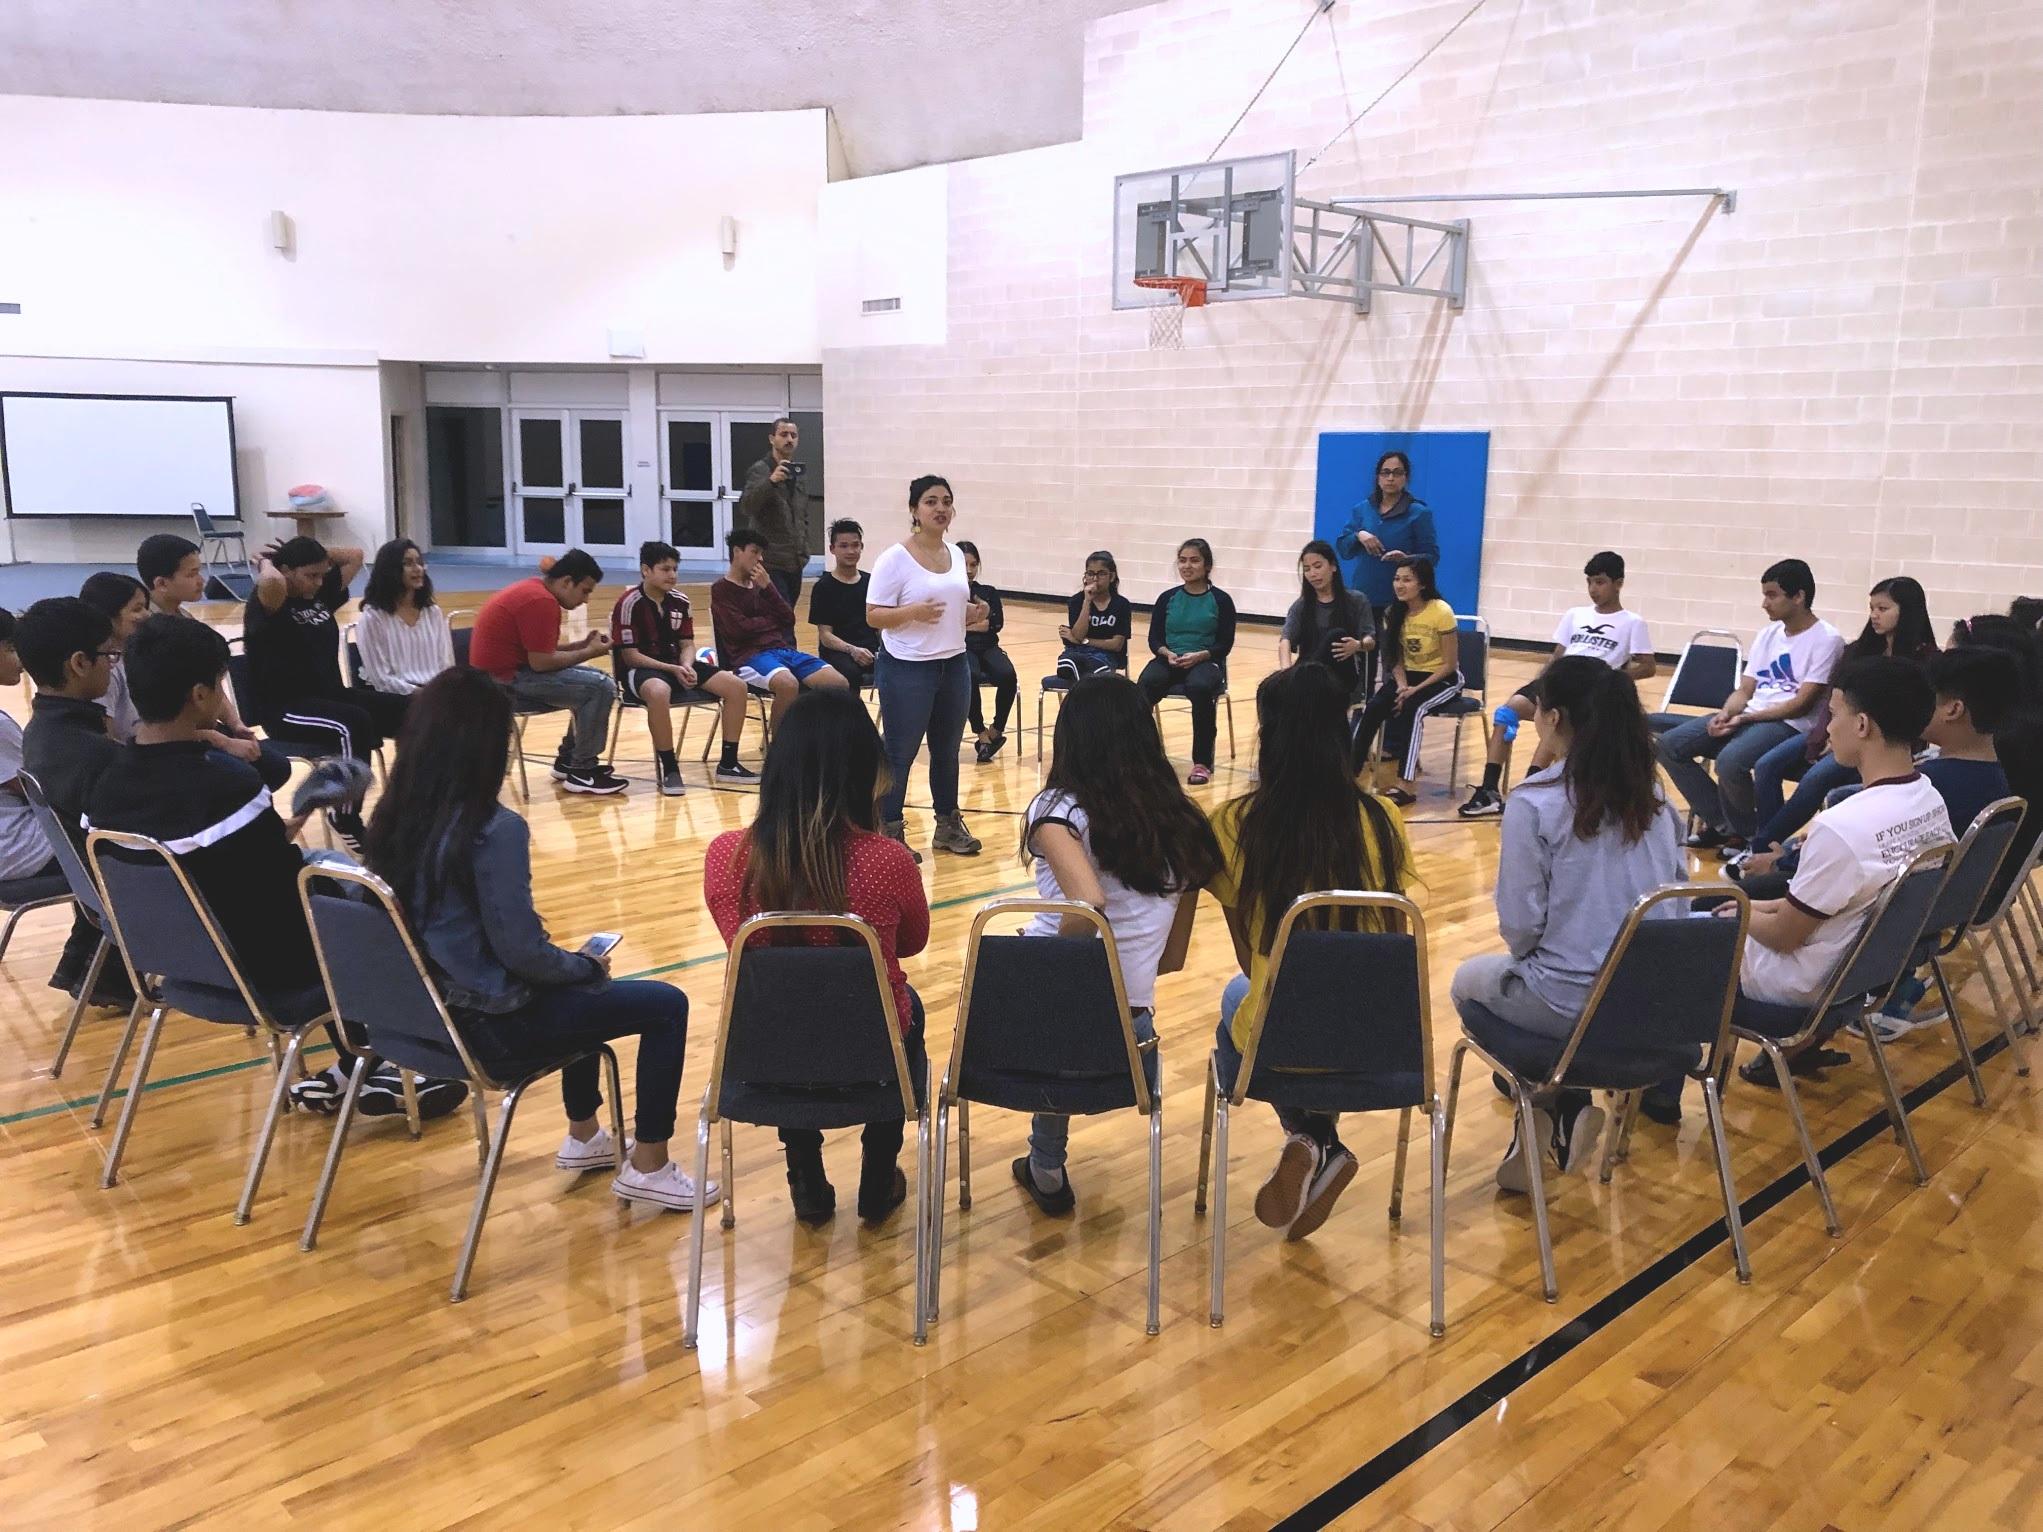 Shakti Workshop with Bhutanese Hindu Refugee Kids in Texas, March 2019